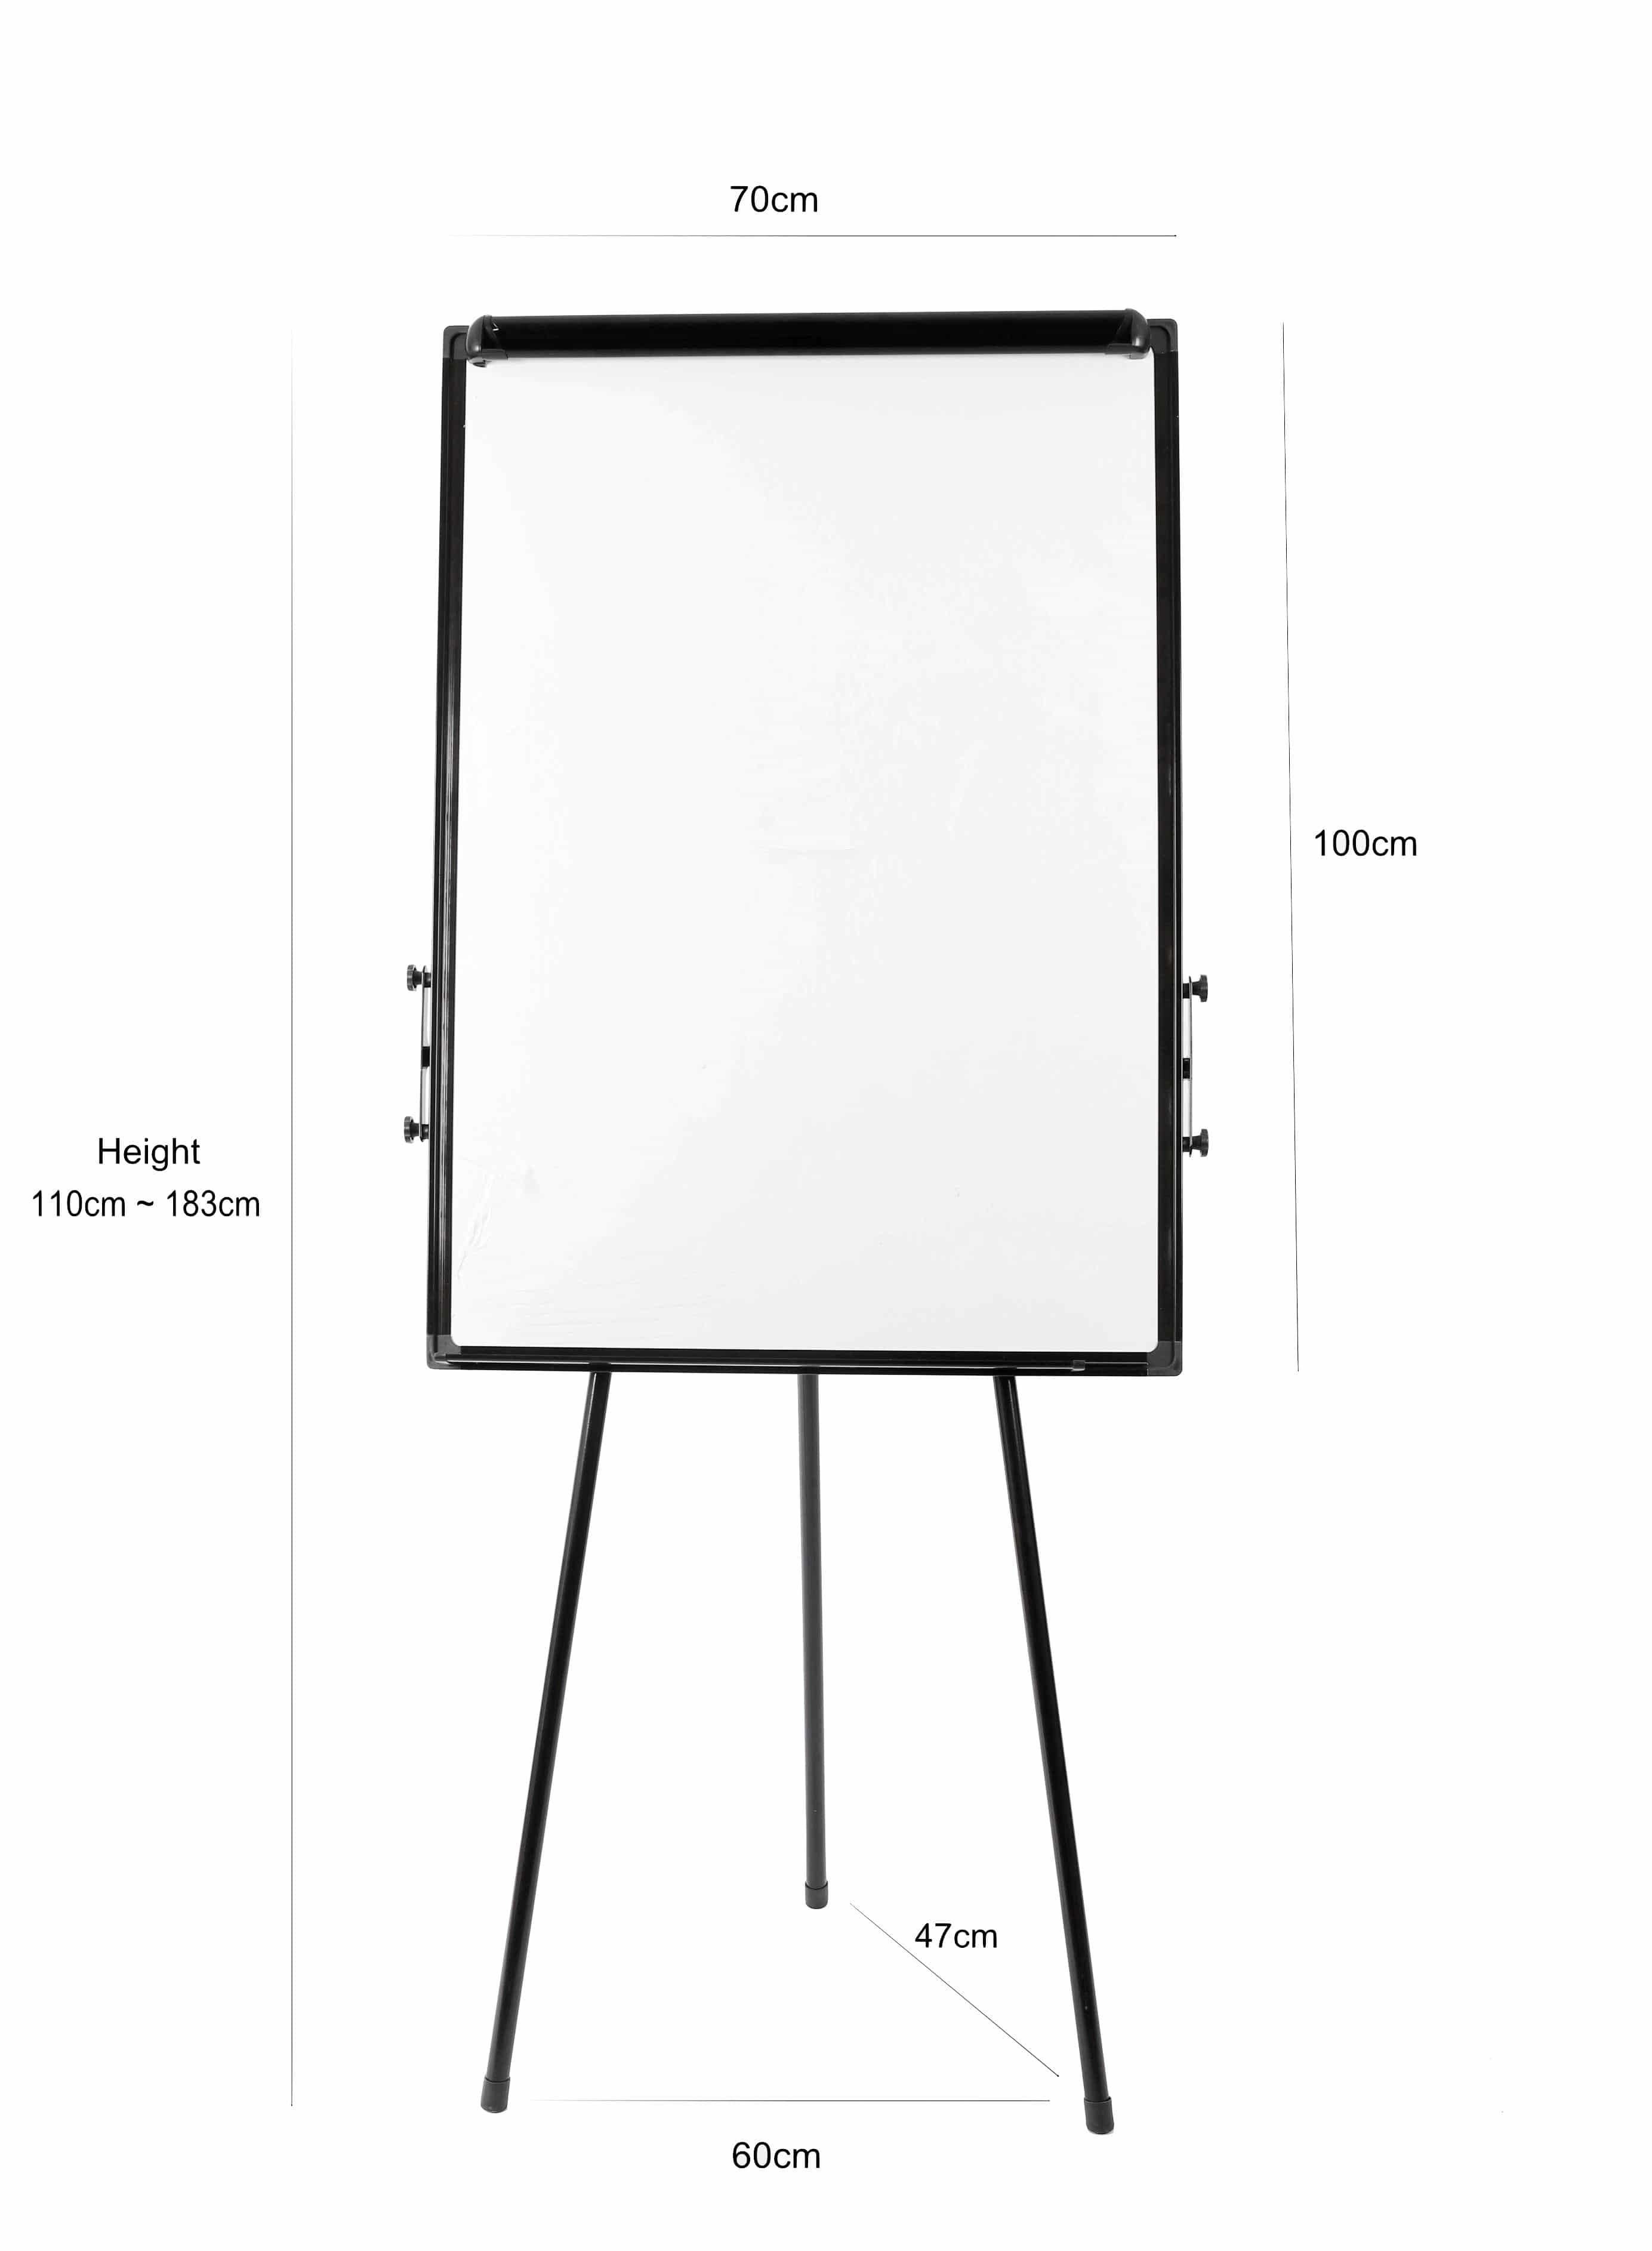 4offiz lichtgewicht Flipover inclusief toebehoren - 110-183cm - zwart